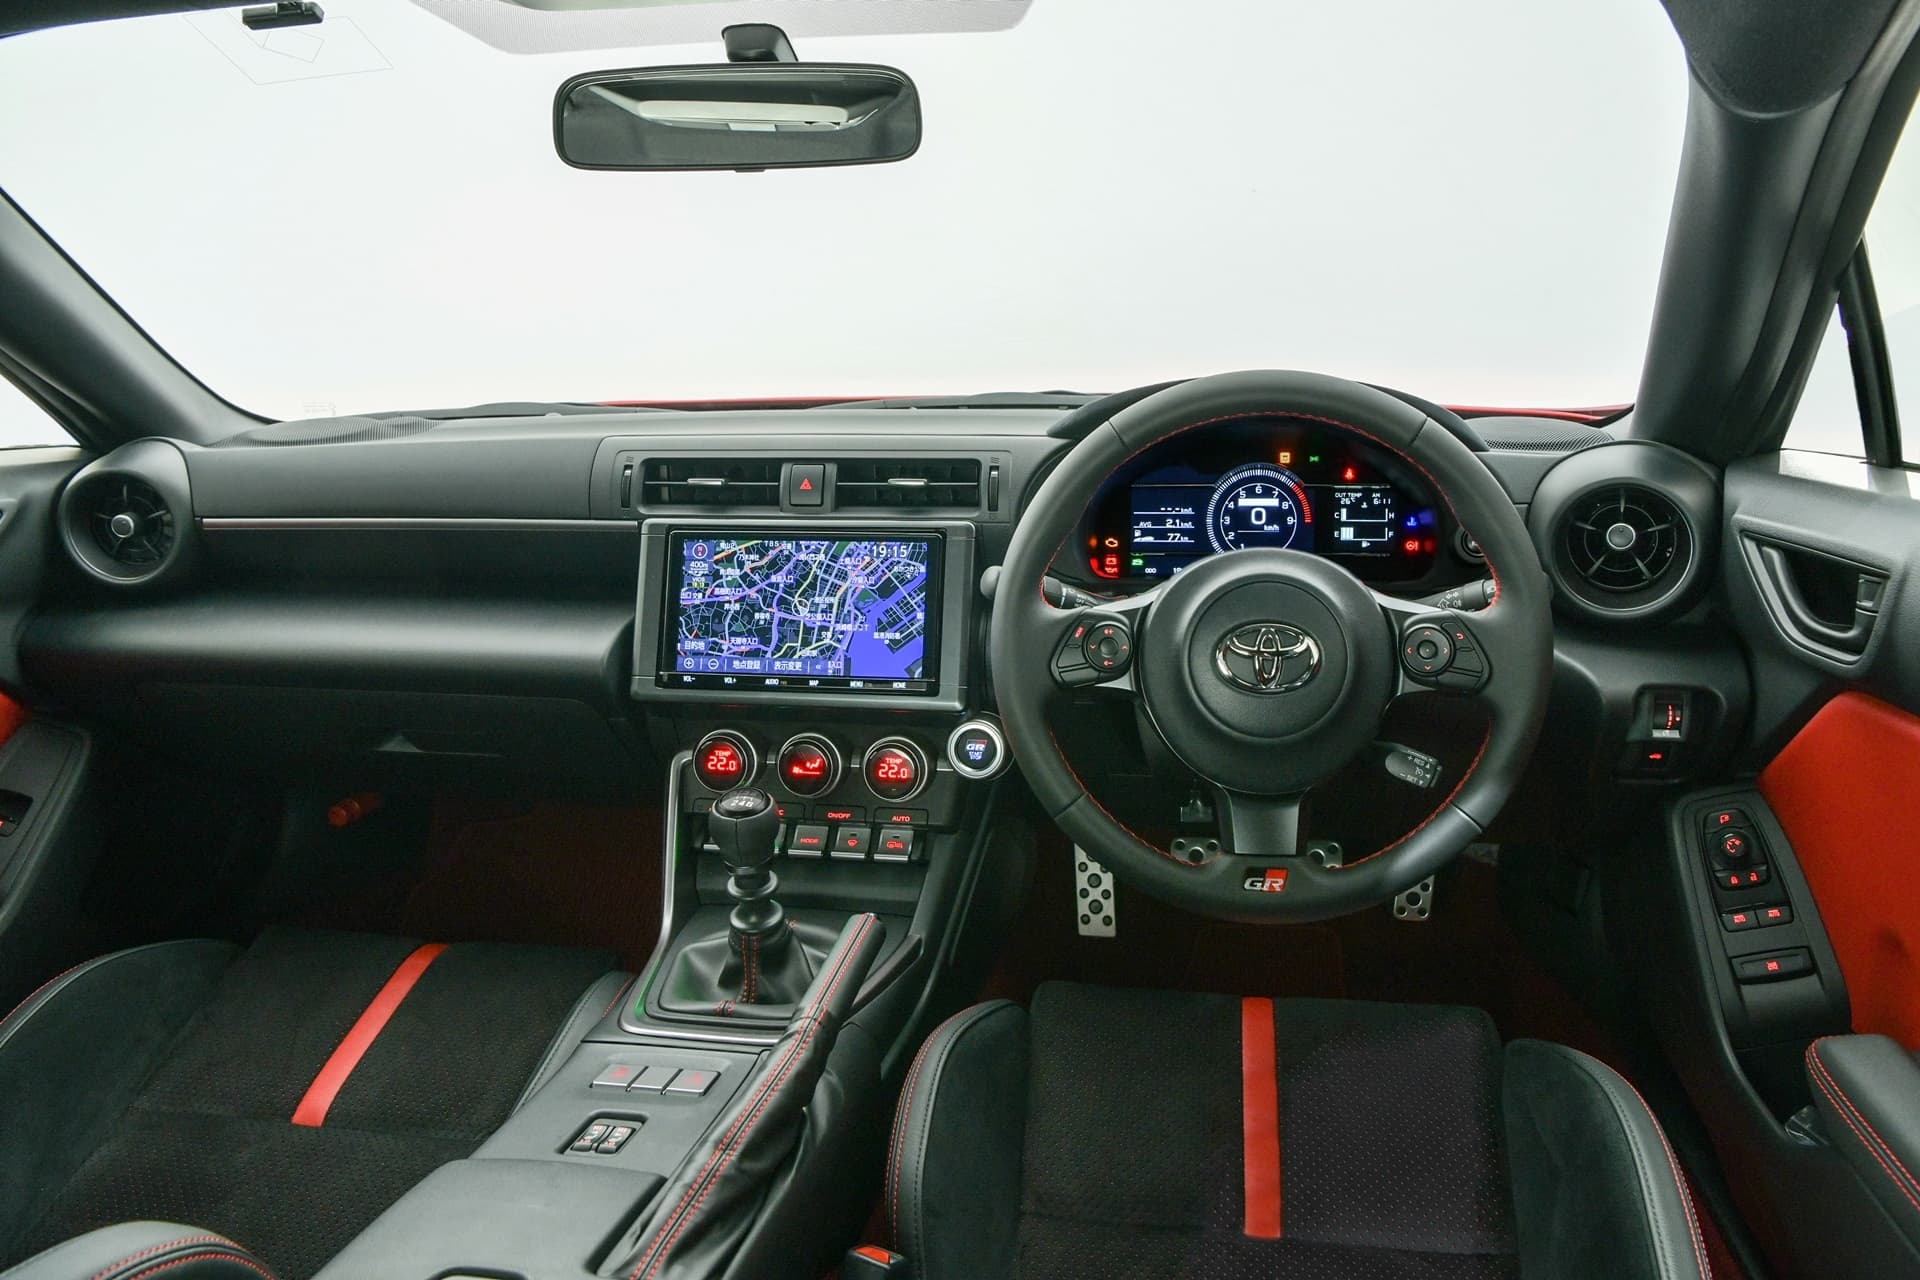 Toyota Gr86 2022 Interior Volante 0421 008